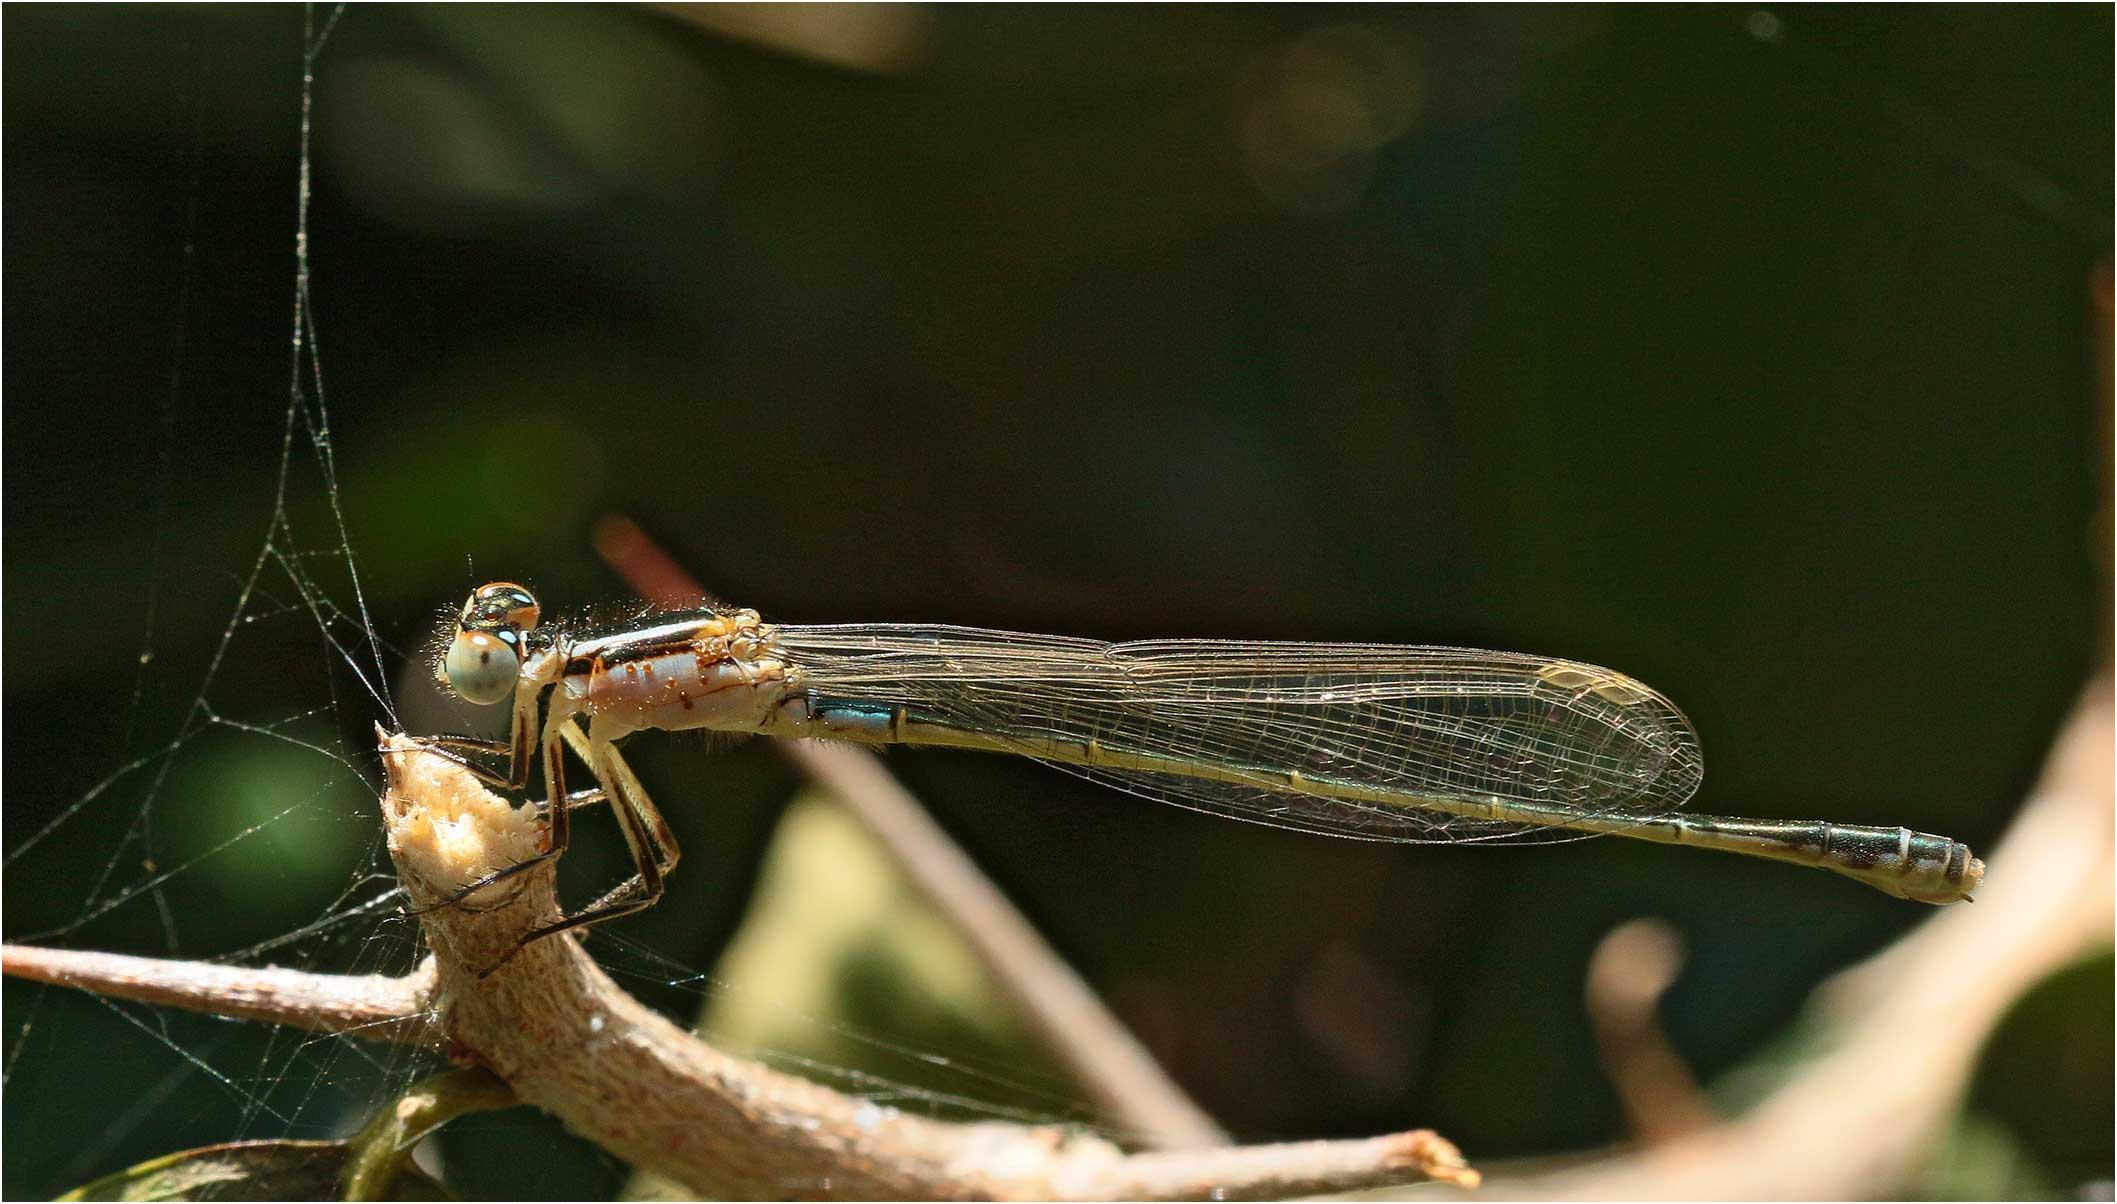 Ischnura senegalensis femelle, Ethiopie, lac Awasa, 31/10/2018